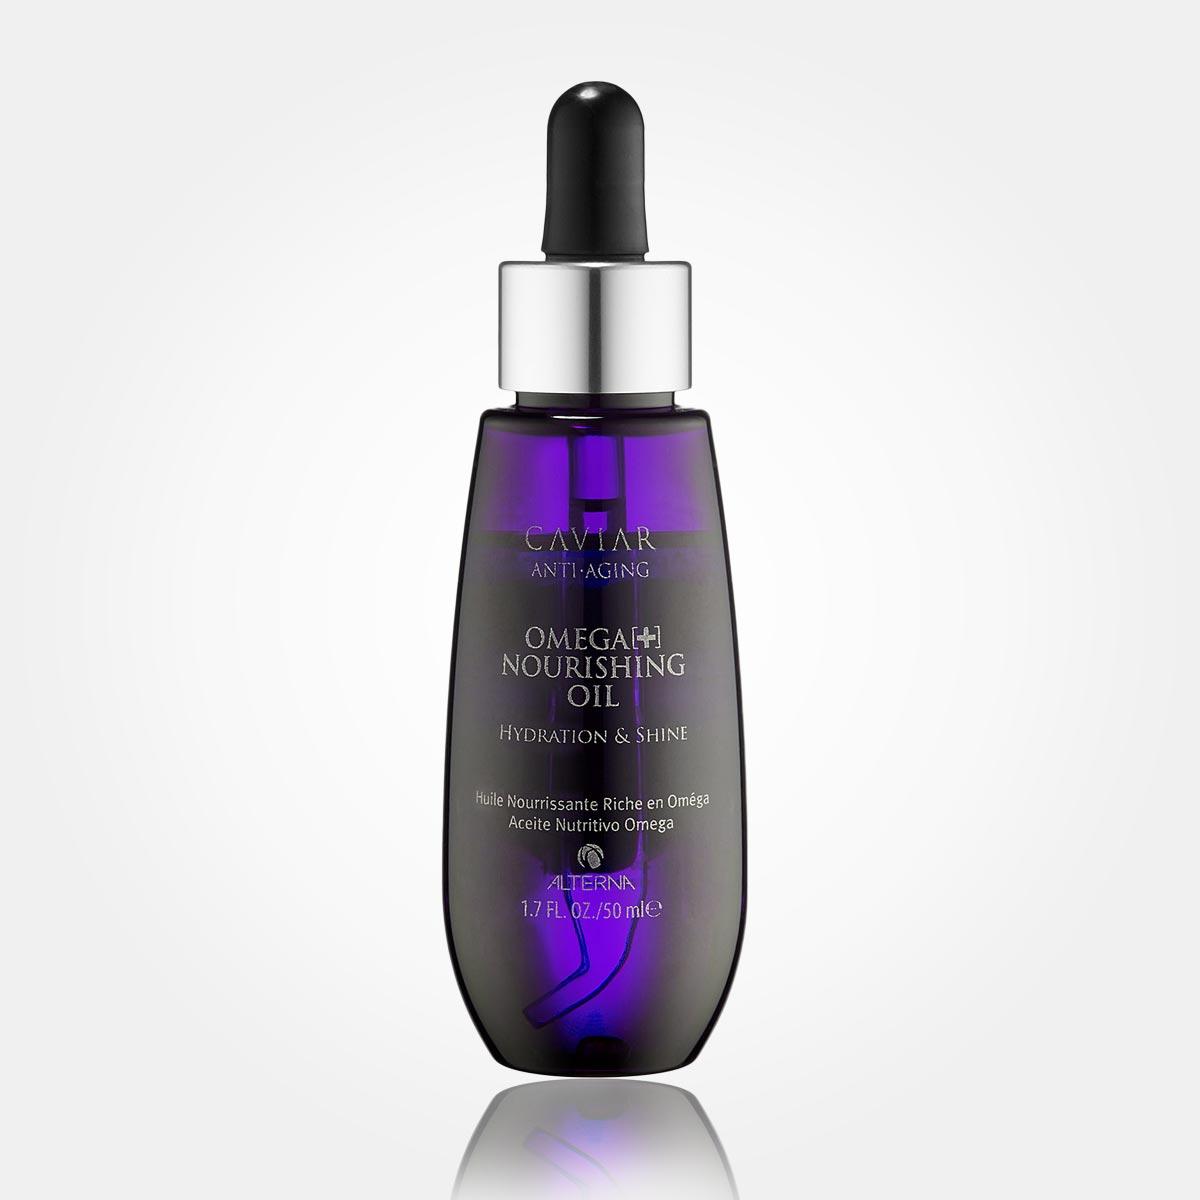 Vlny vo vlasoch – namiesto tradičného stylingu použite v Alterna Caviar Anti-Aging Omega+ Nourishing Oil.